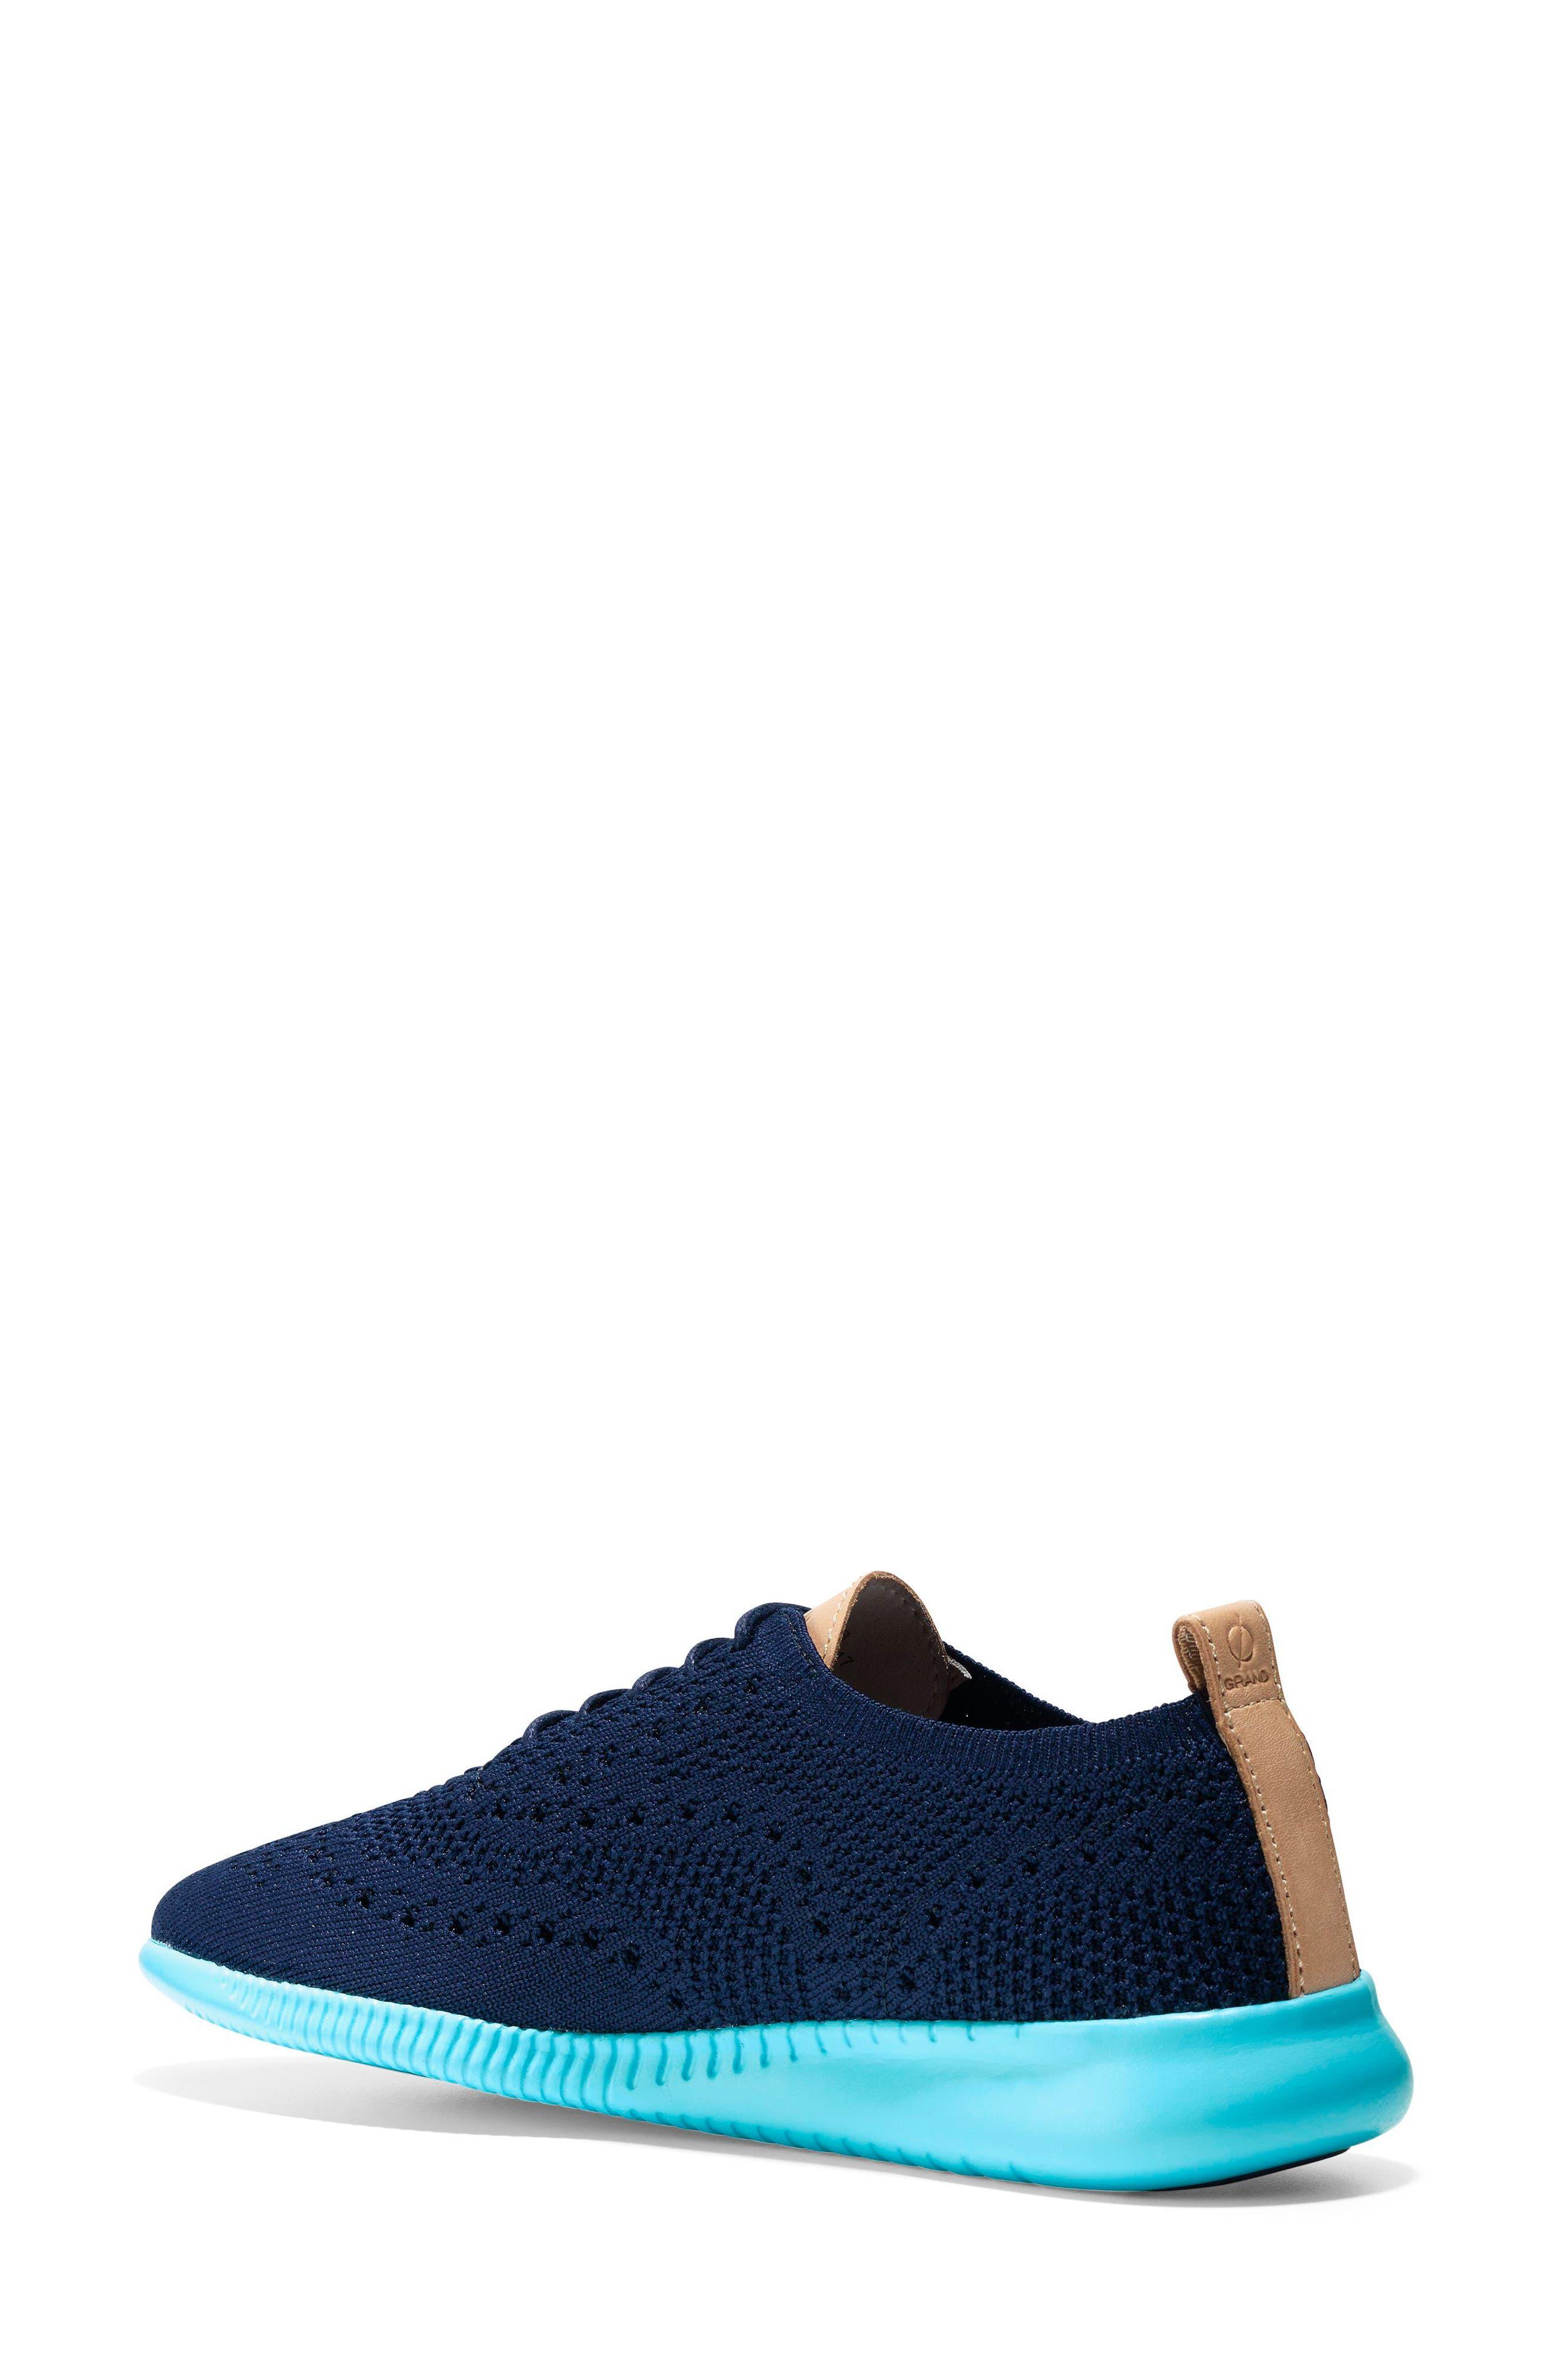 2.ZERØGRAND Stitchlite Wingtip Sneaker,                             Alternate thumbnail 2, color,                             MARINE BLUE/ BLUEFISH FABRIC